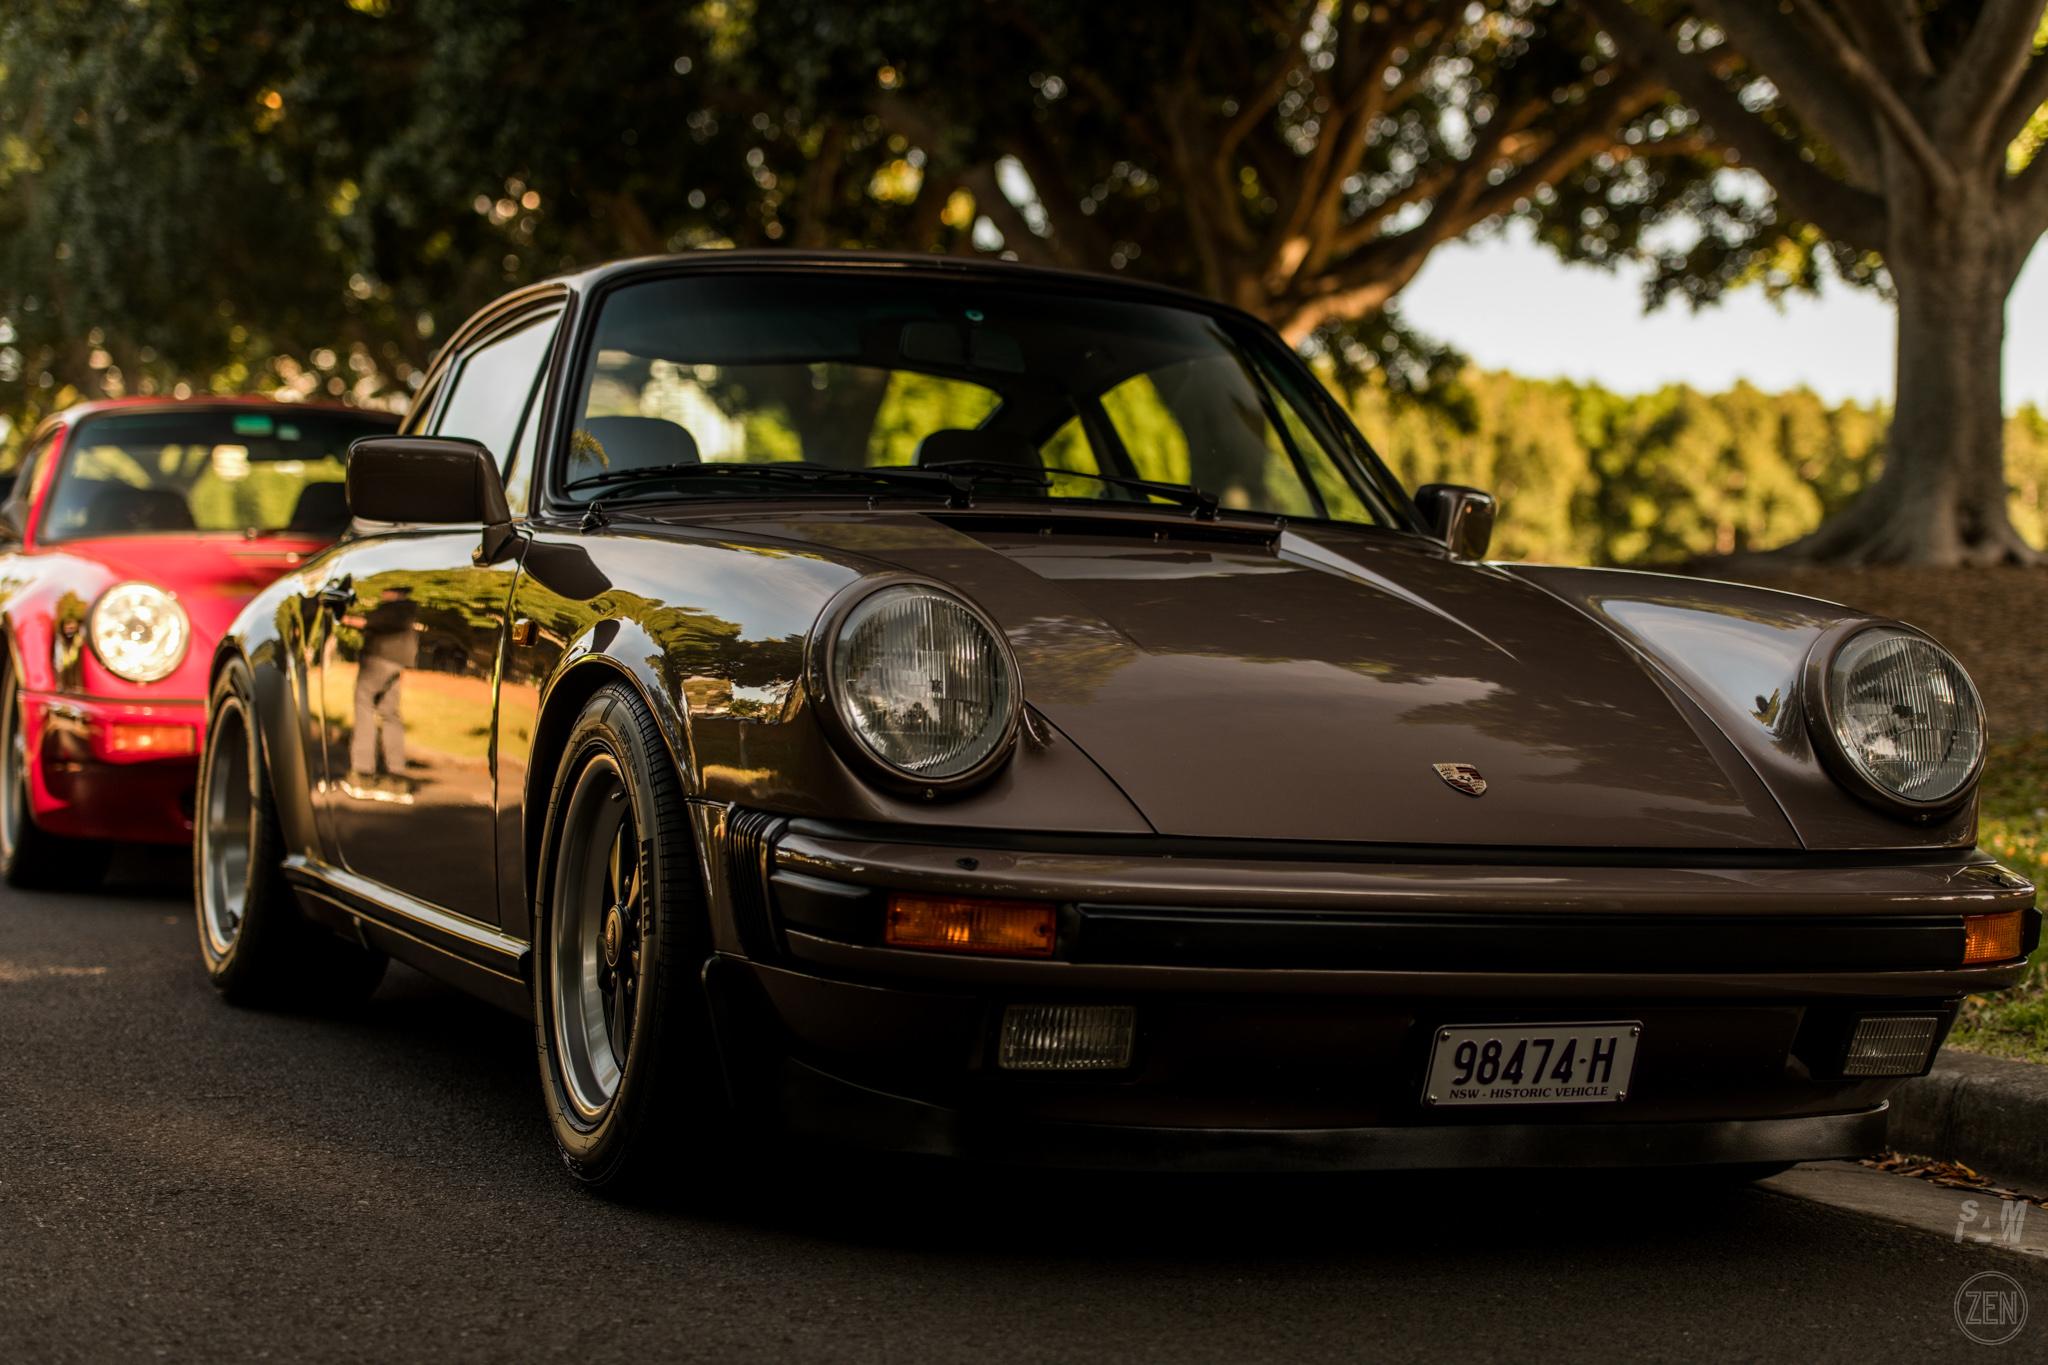 2019-10-27 - Autohaus Porsches & Coffee 082